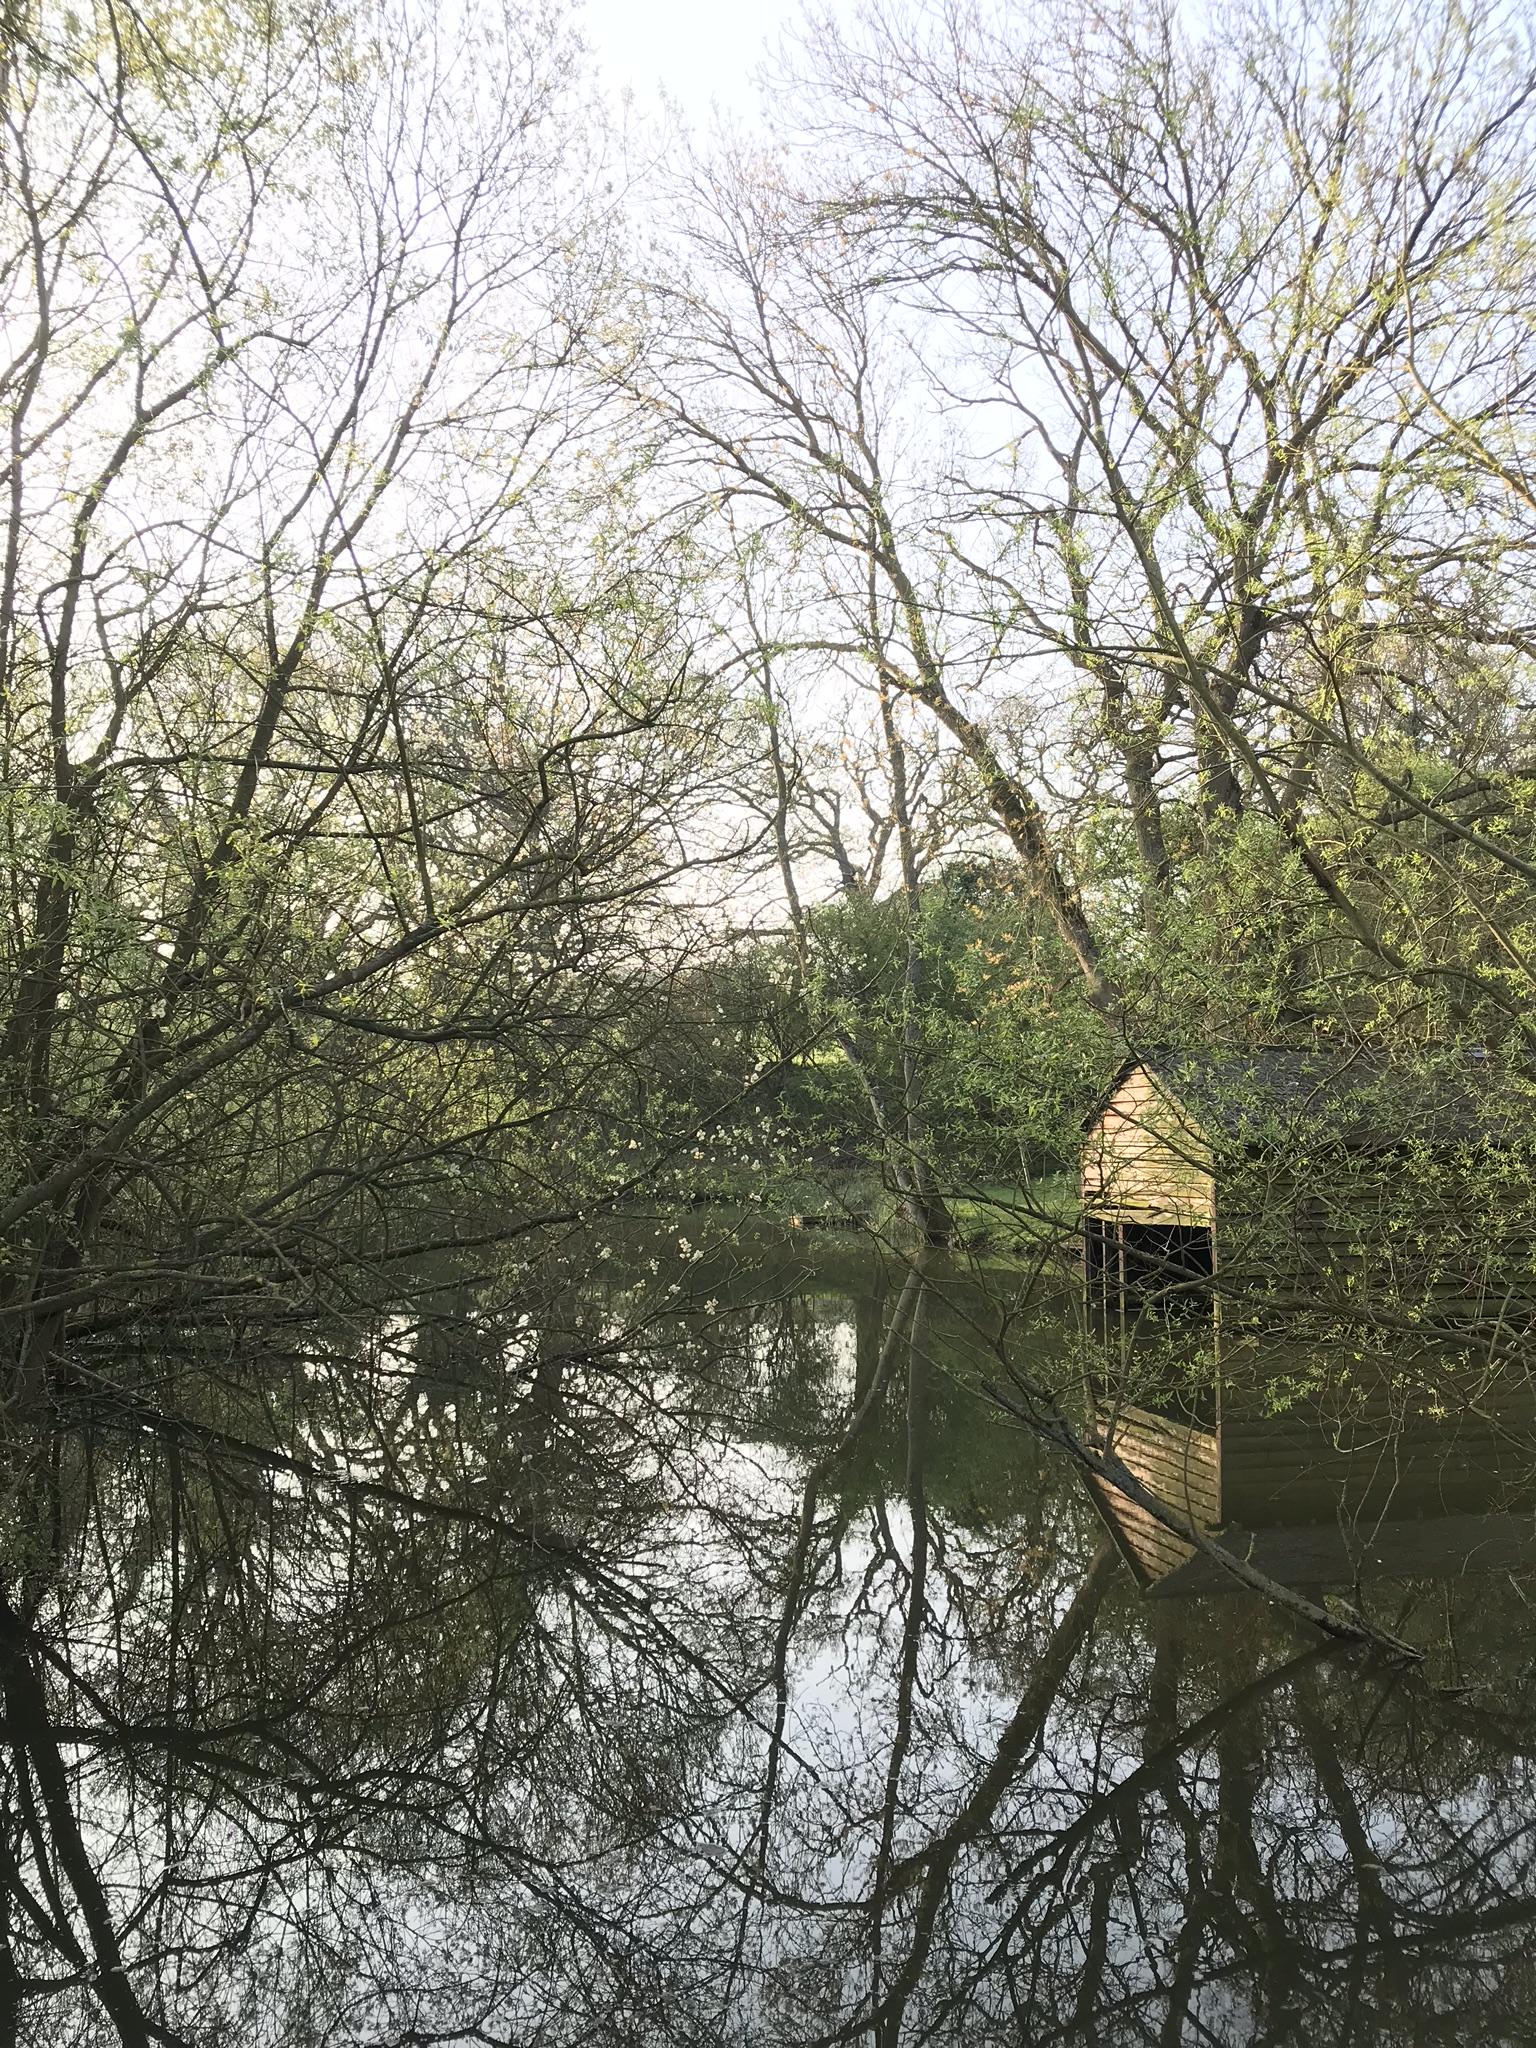 Mill pond bedfordshire